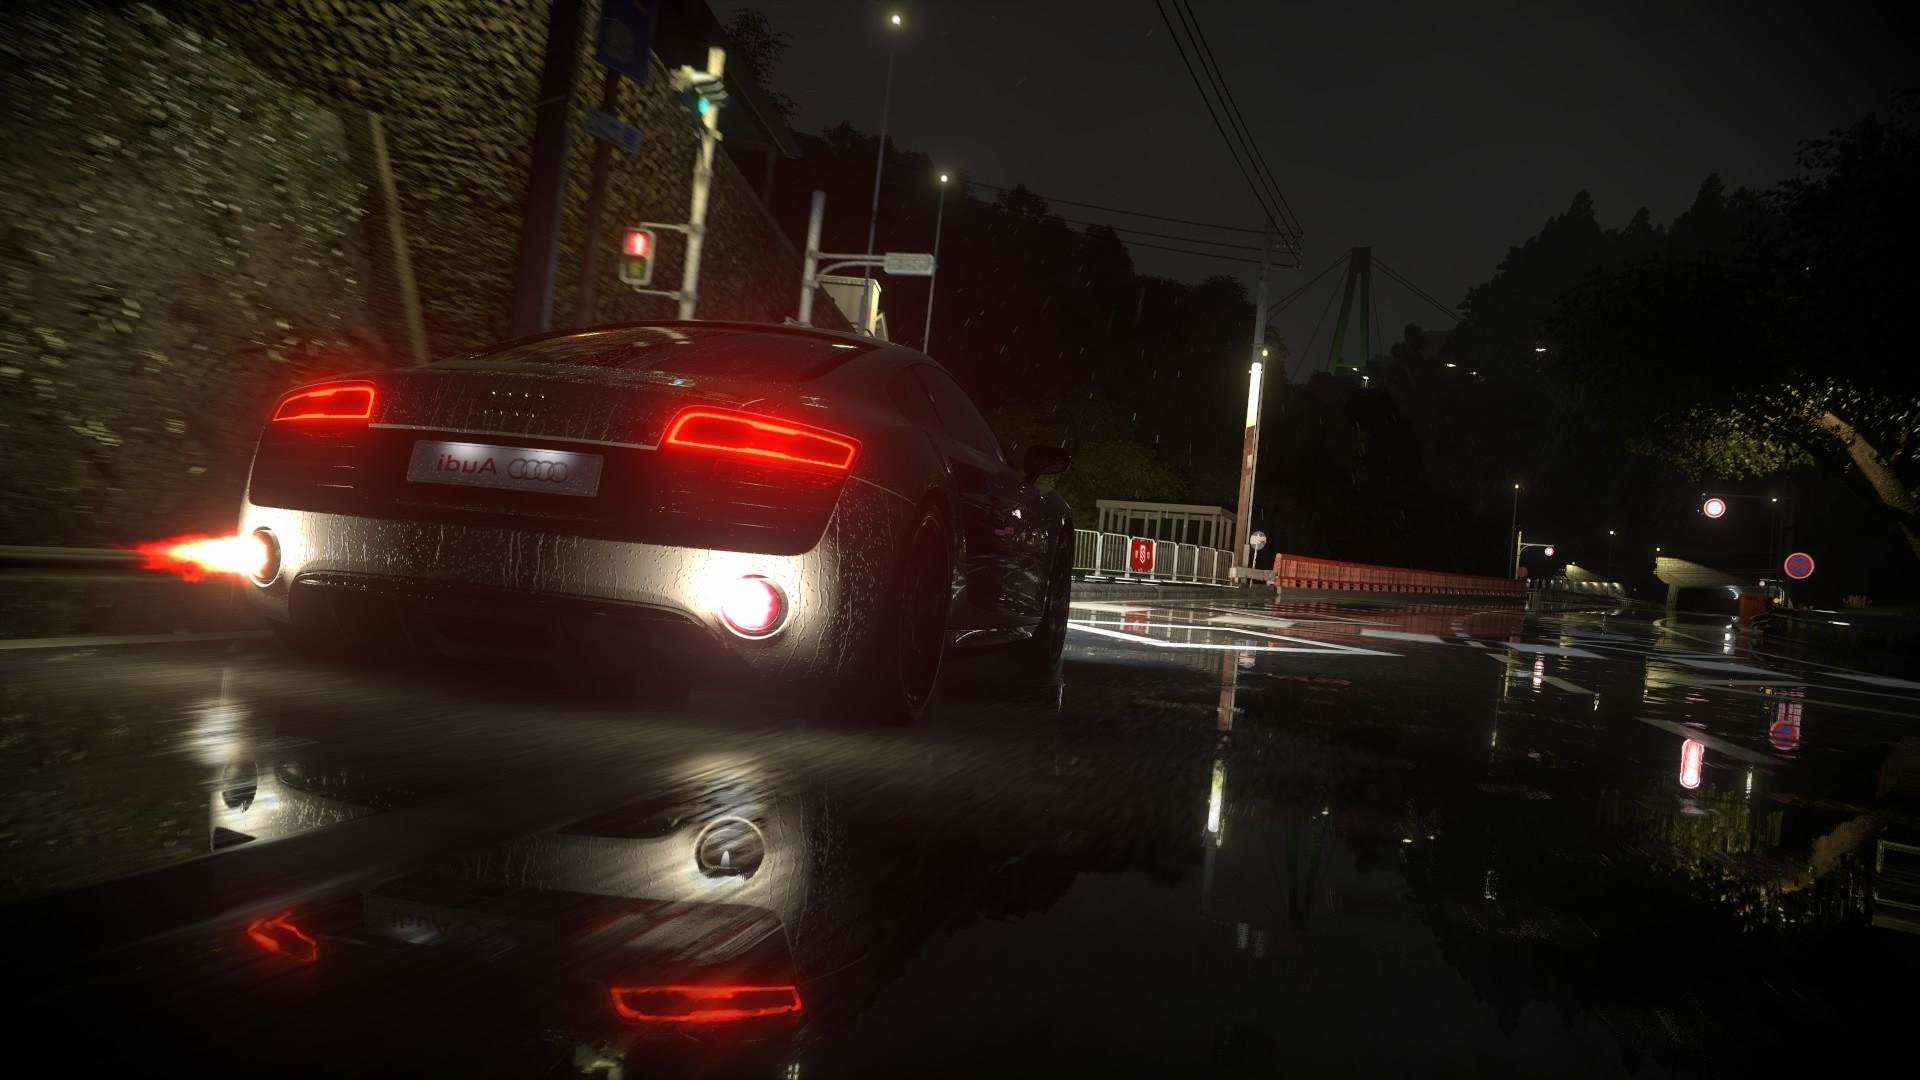 Classic Mustang Car Wallpaper Driveclub Audi V10 Engine Rain Audi R8 Video Games